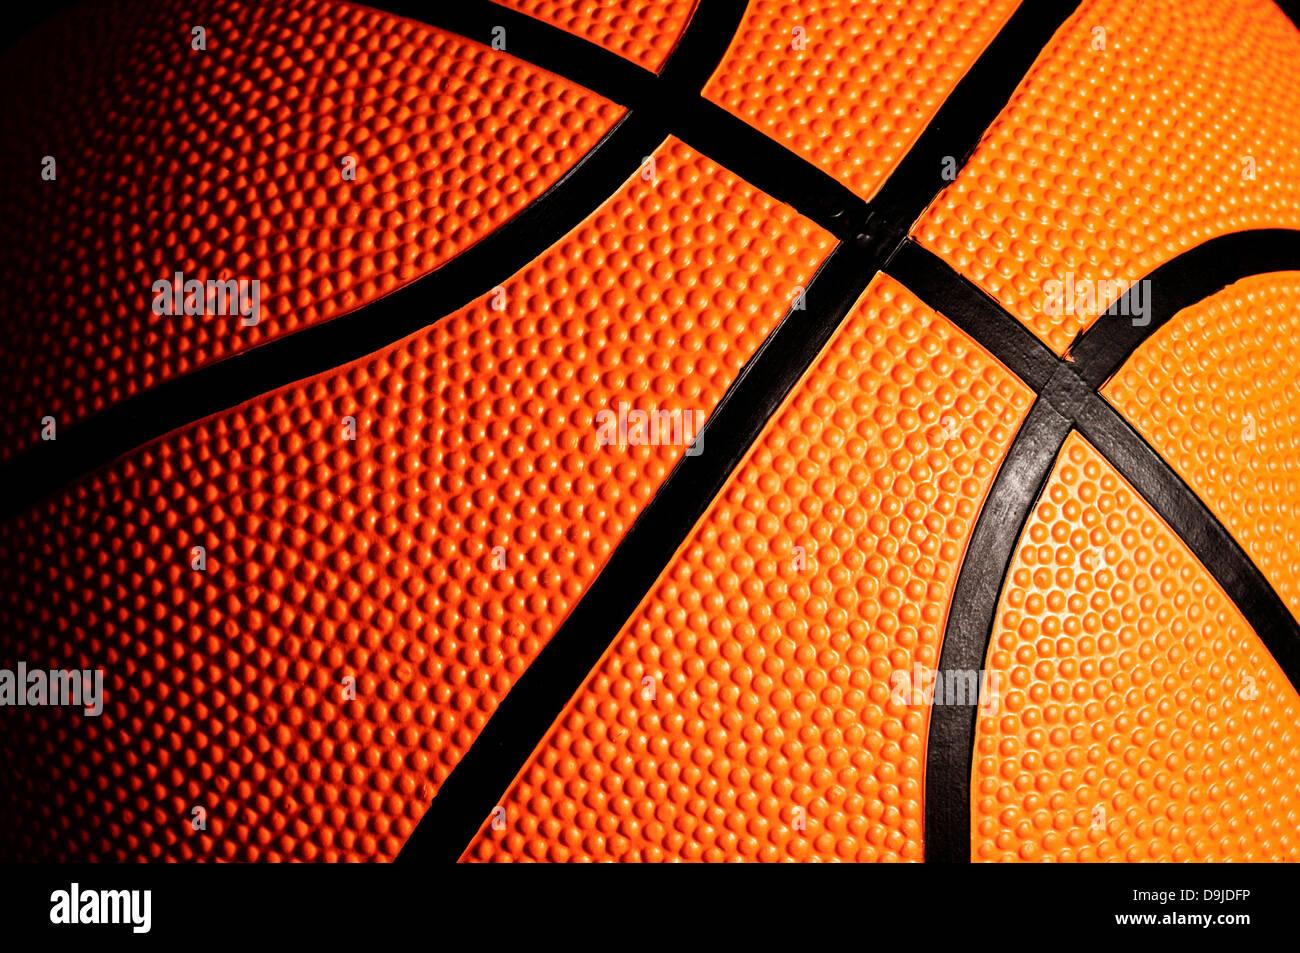 Détail d'un ballon de basket-ball Photo Stock